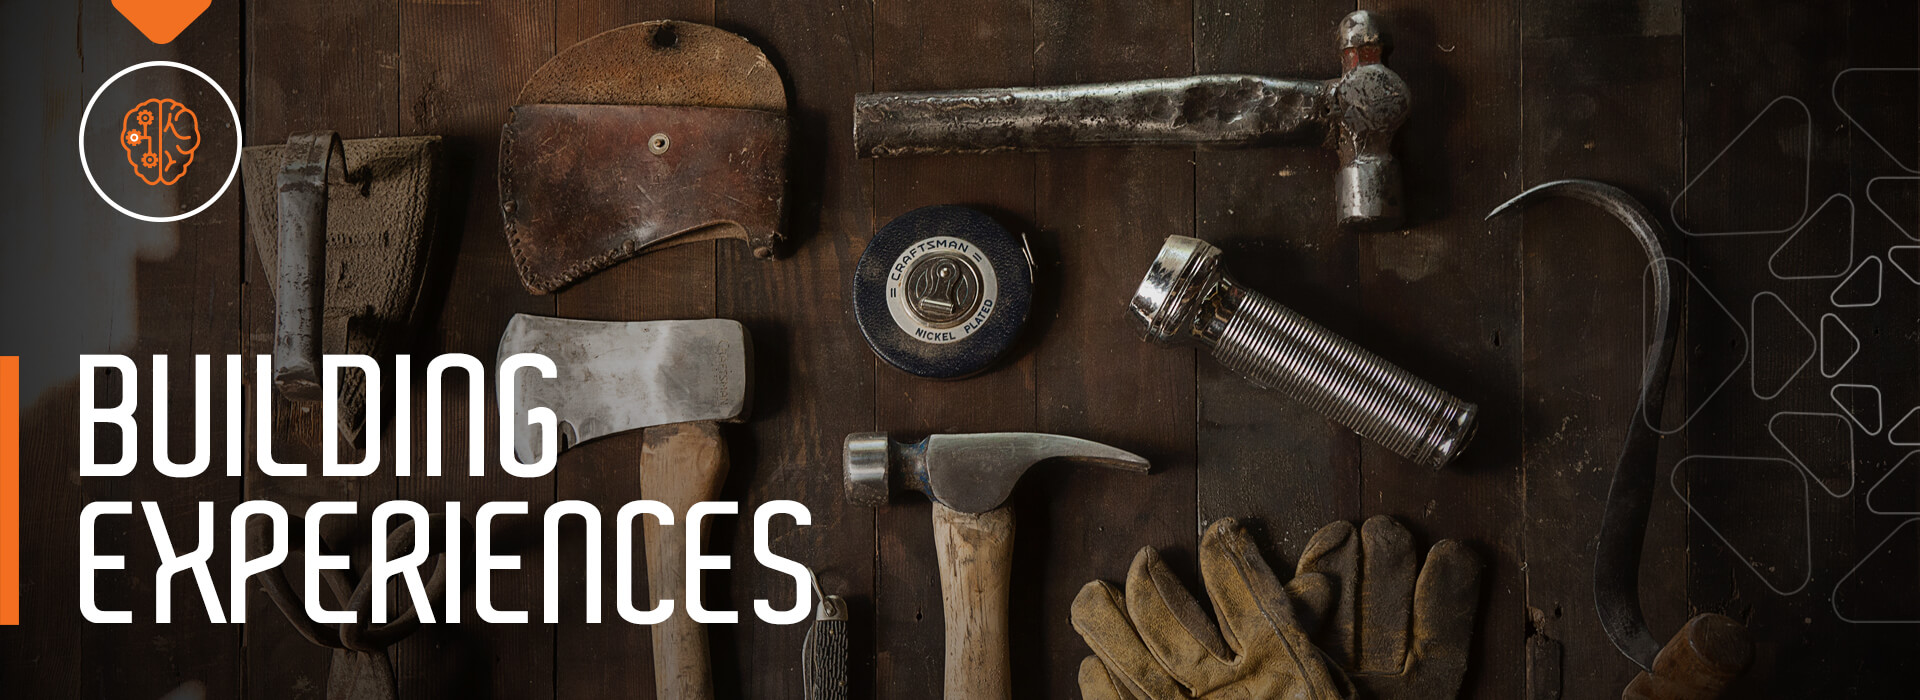 Building Experiences